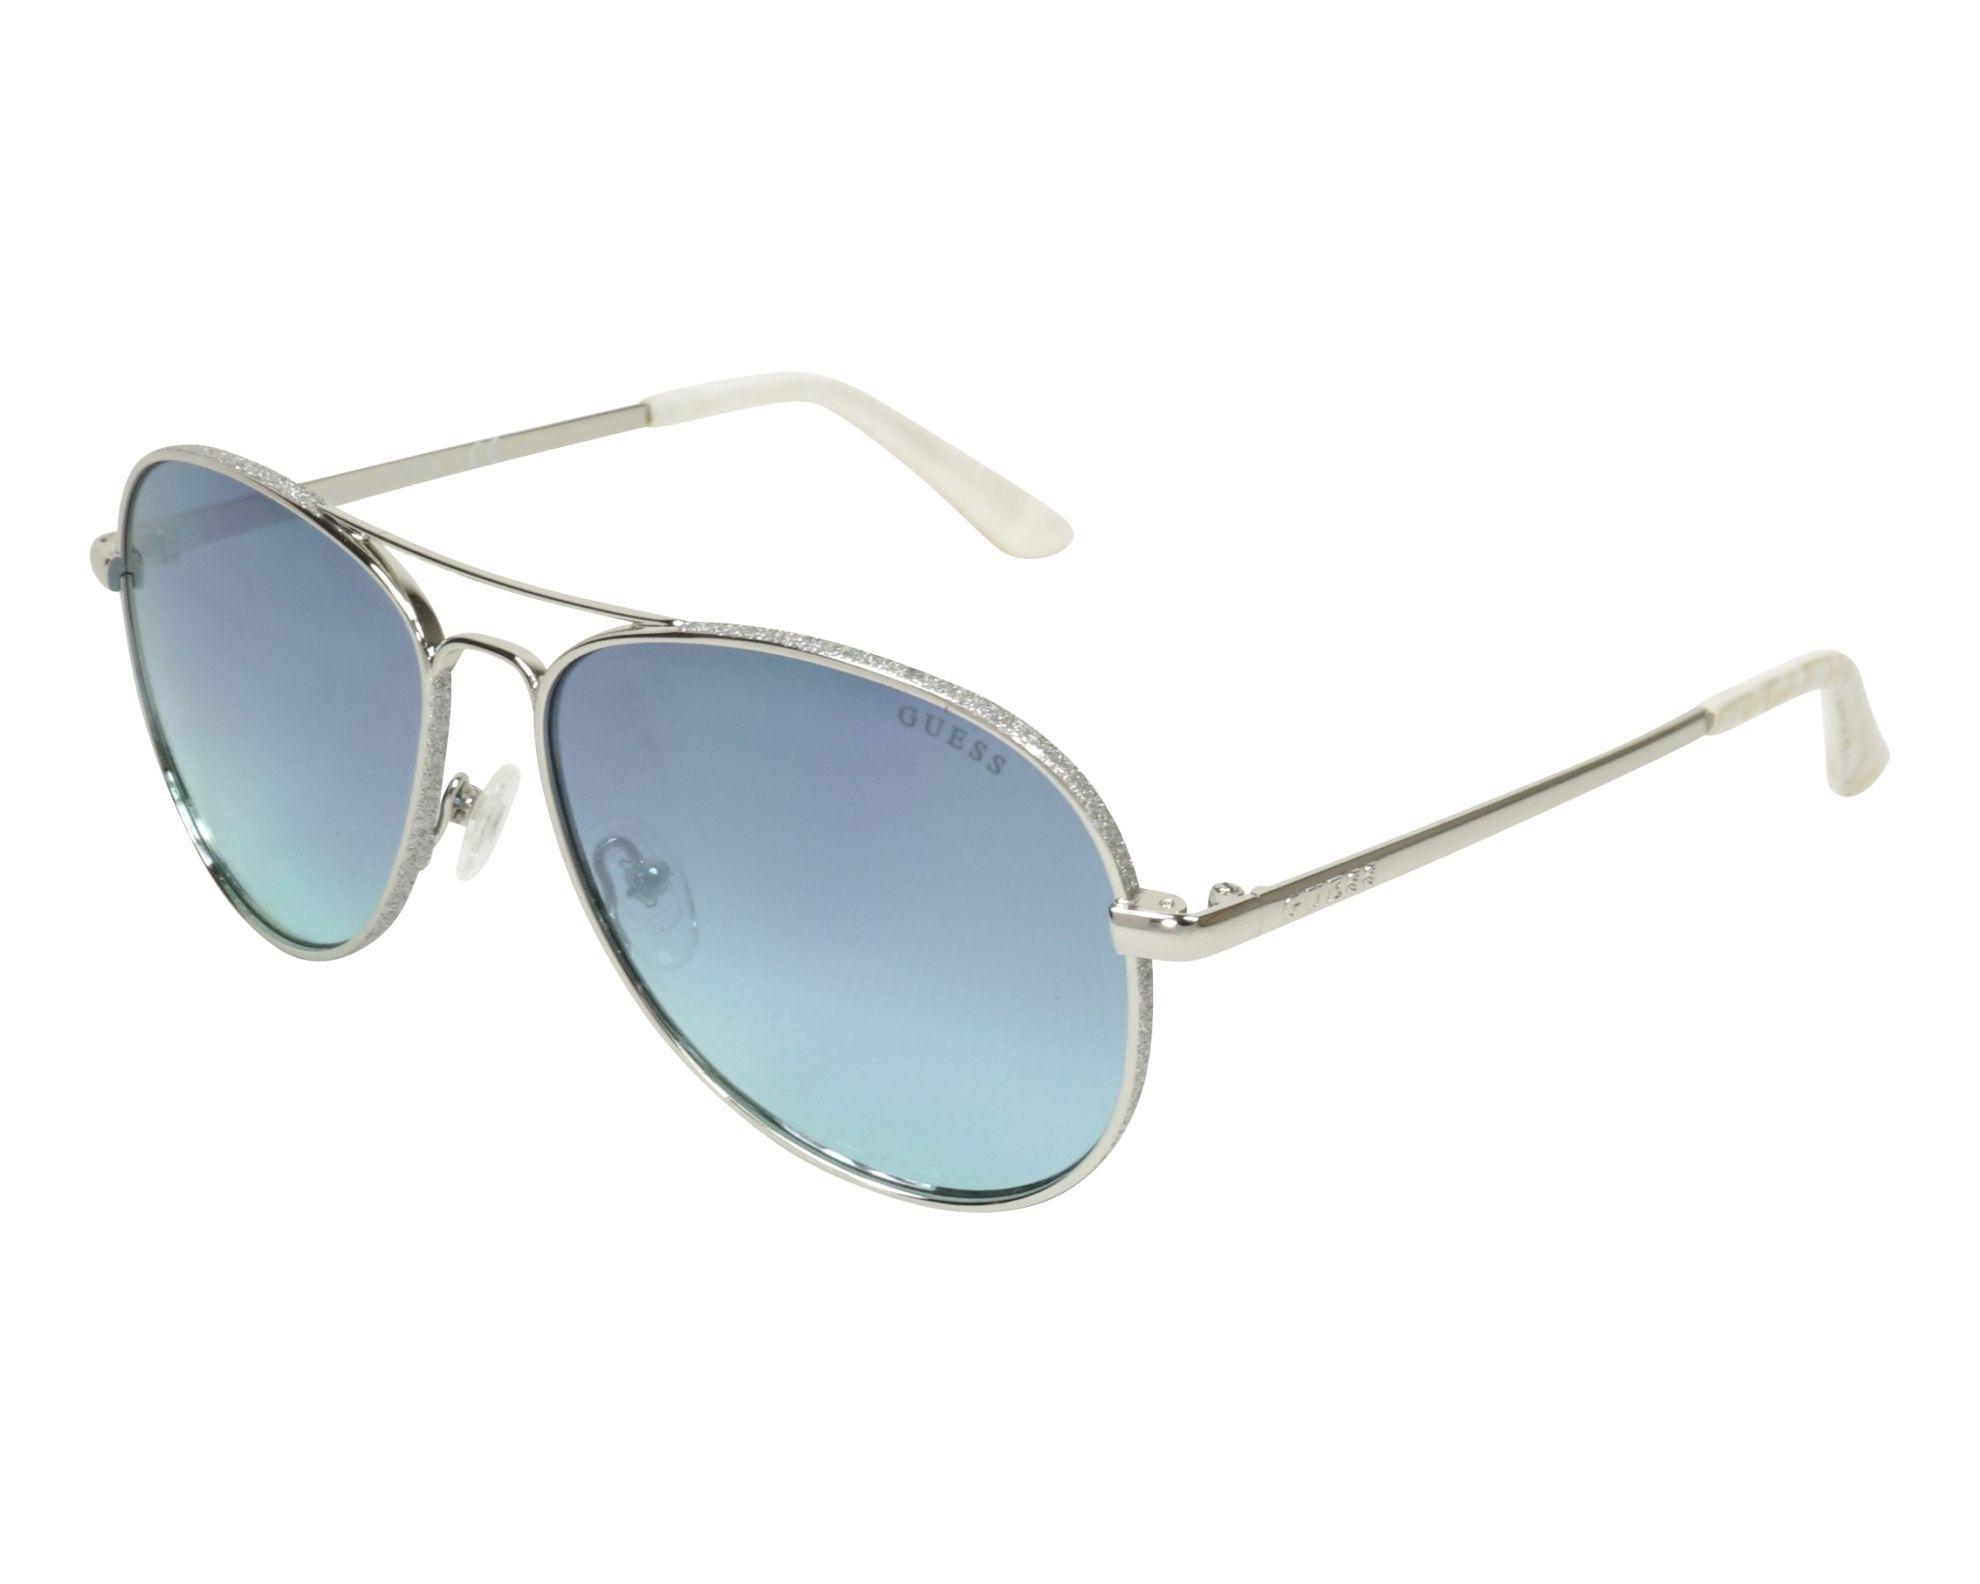 61a2ae7eed4 Sunglasses Guess GU-7555-S 10X 59-14 Silver Silver profile view